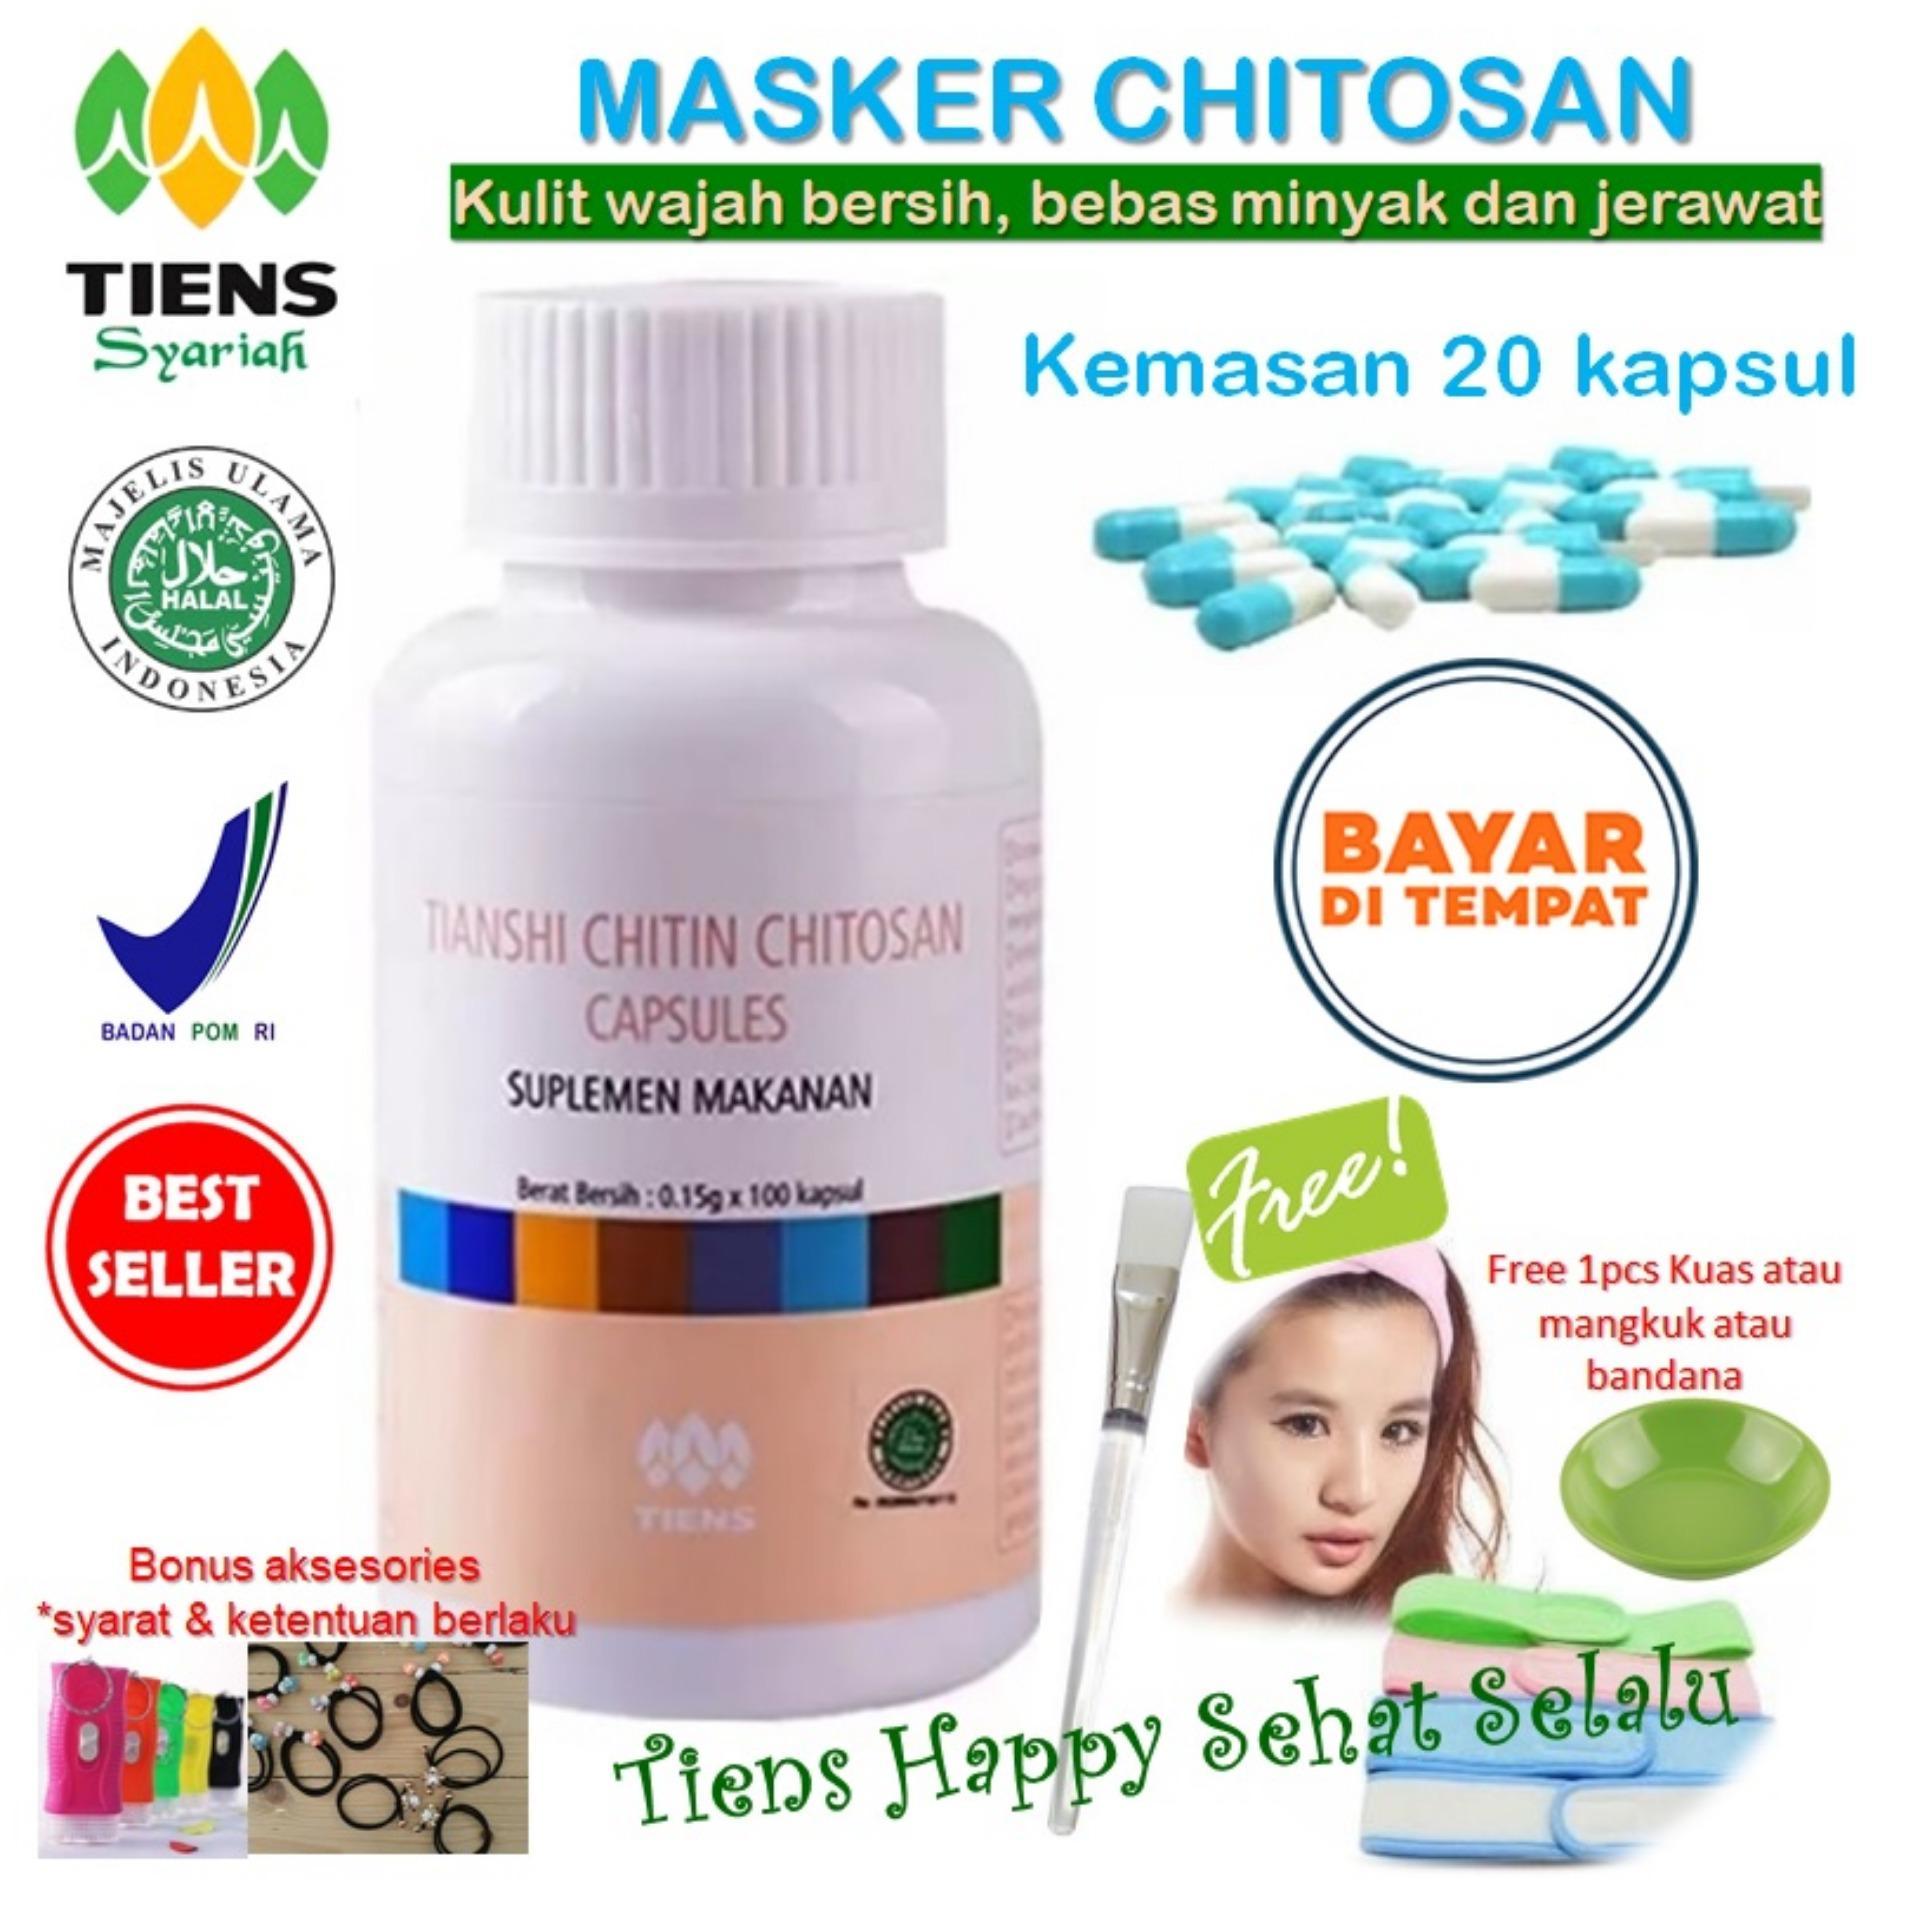 Beli Tiens Masker Chitosan Herbal Anti Jerawat Paket 20 Kapsul Gratis Kuas By Tiens Happy Sehat Selalu Cicilan